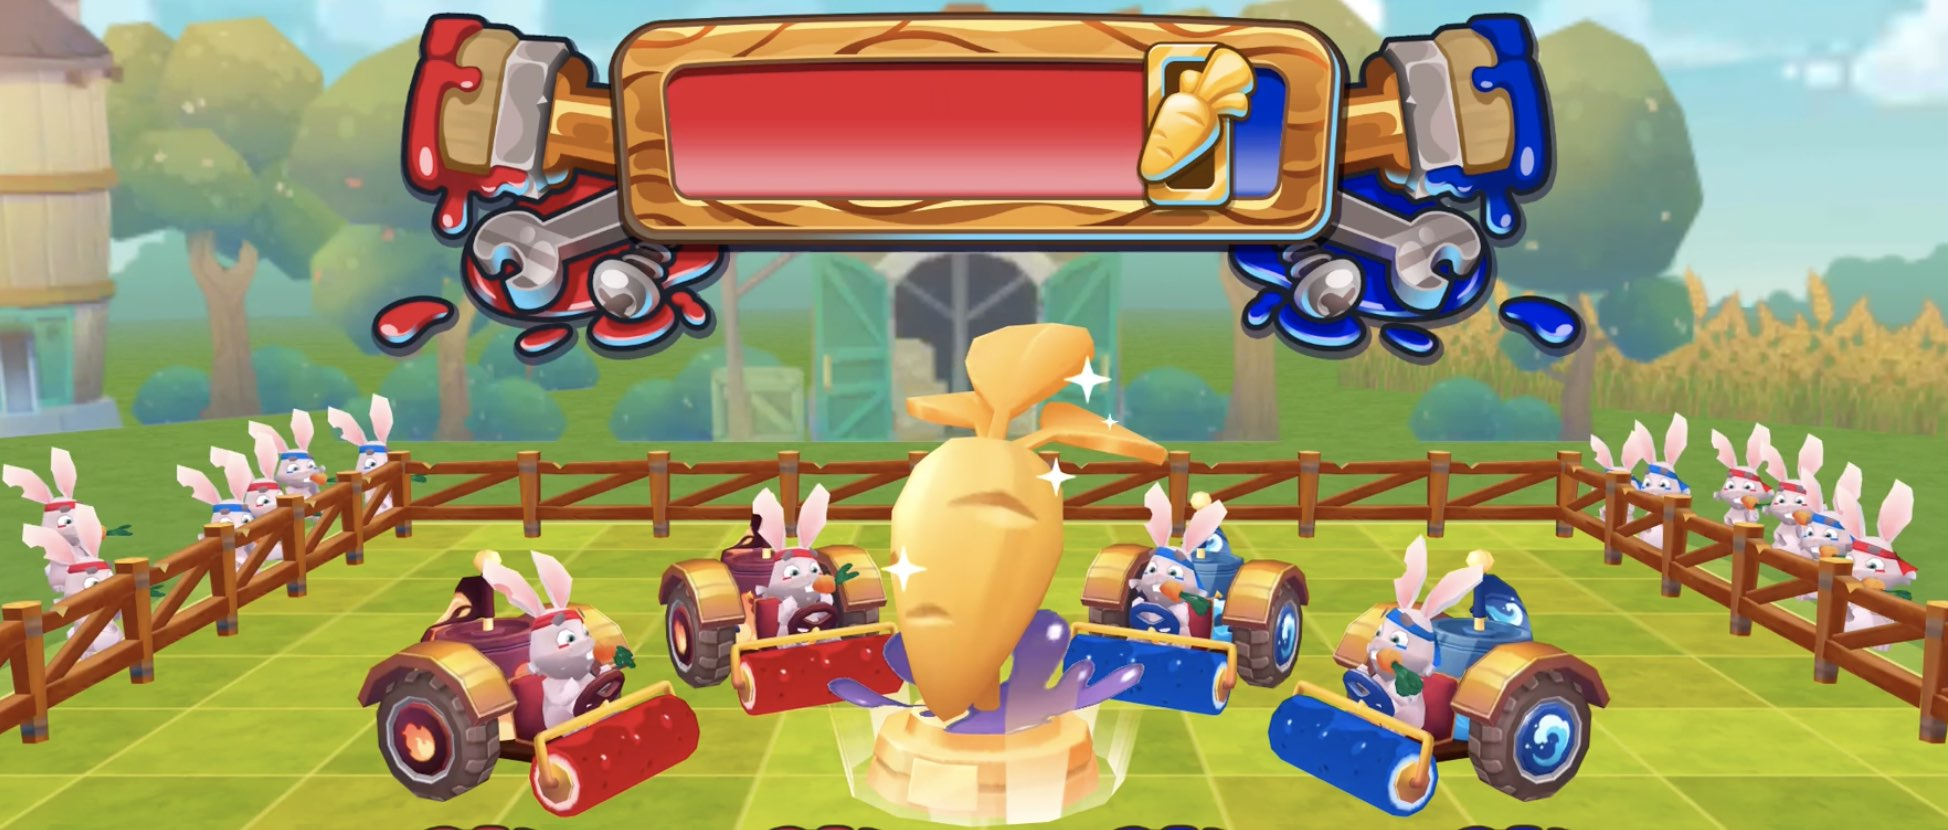 Splash Rabbit Arena tutorial